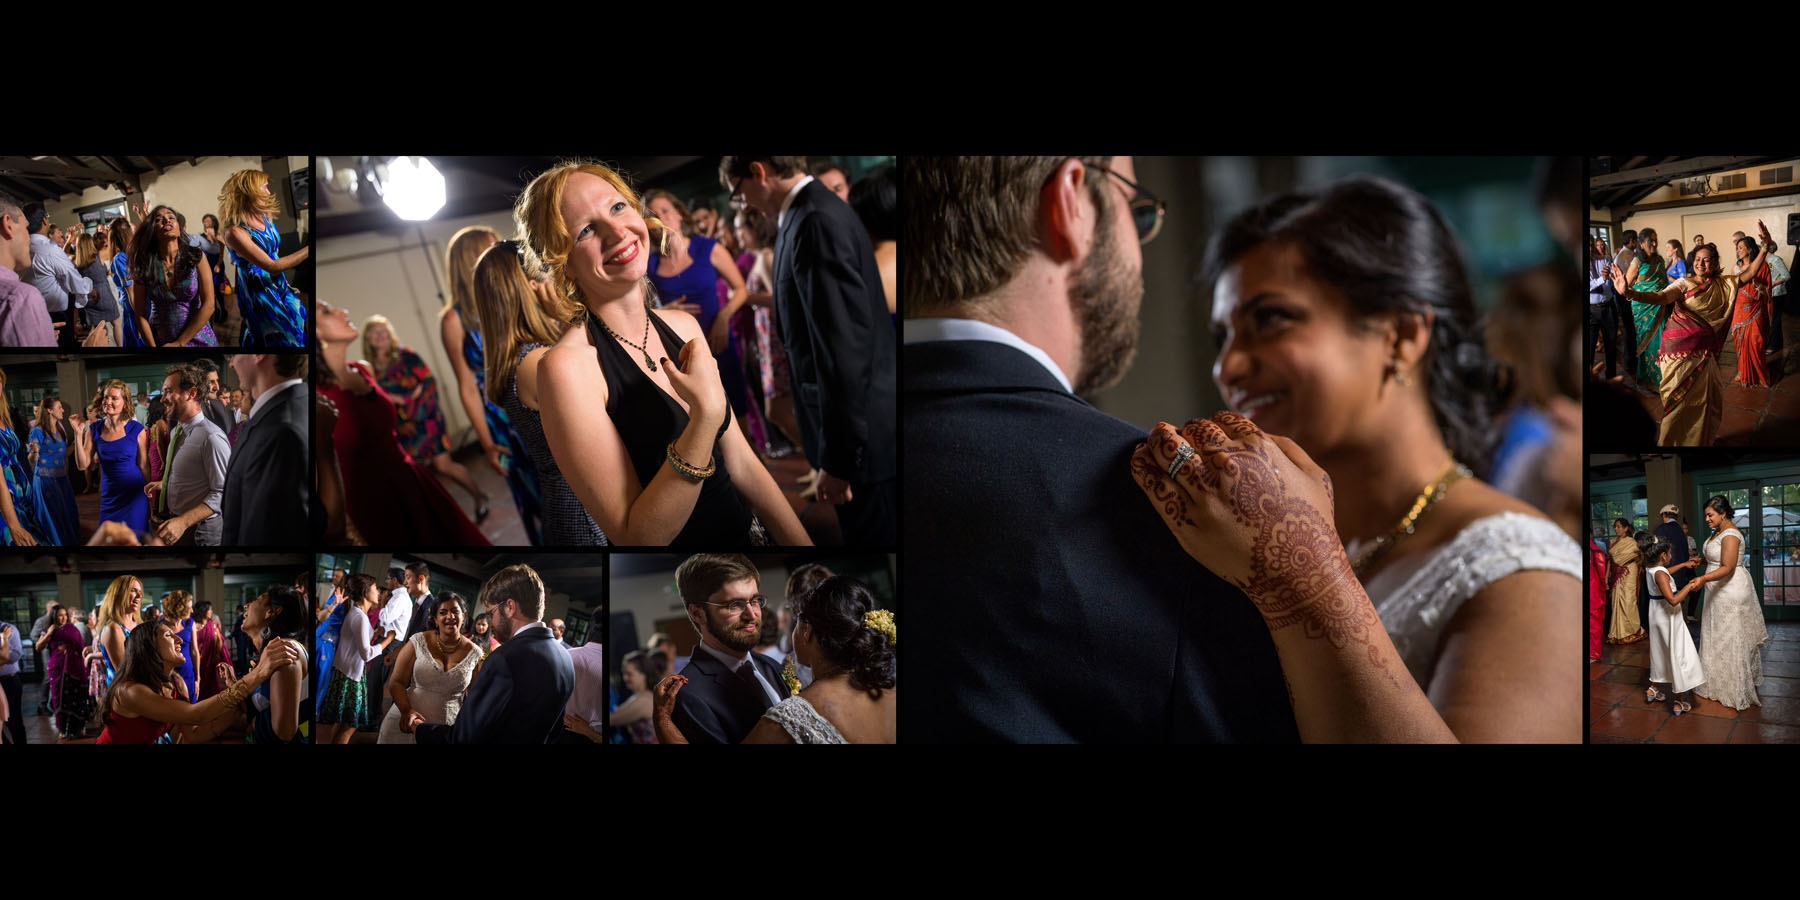 Dancing –Allied Arts Guild –Menlo Park wedding photos –by Bay Area wedding photographer Chris Schmauch